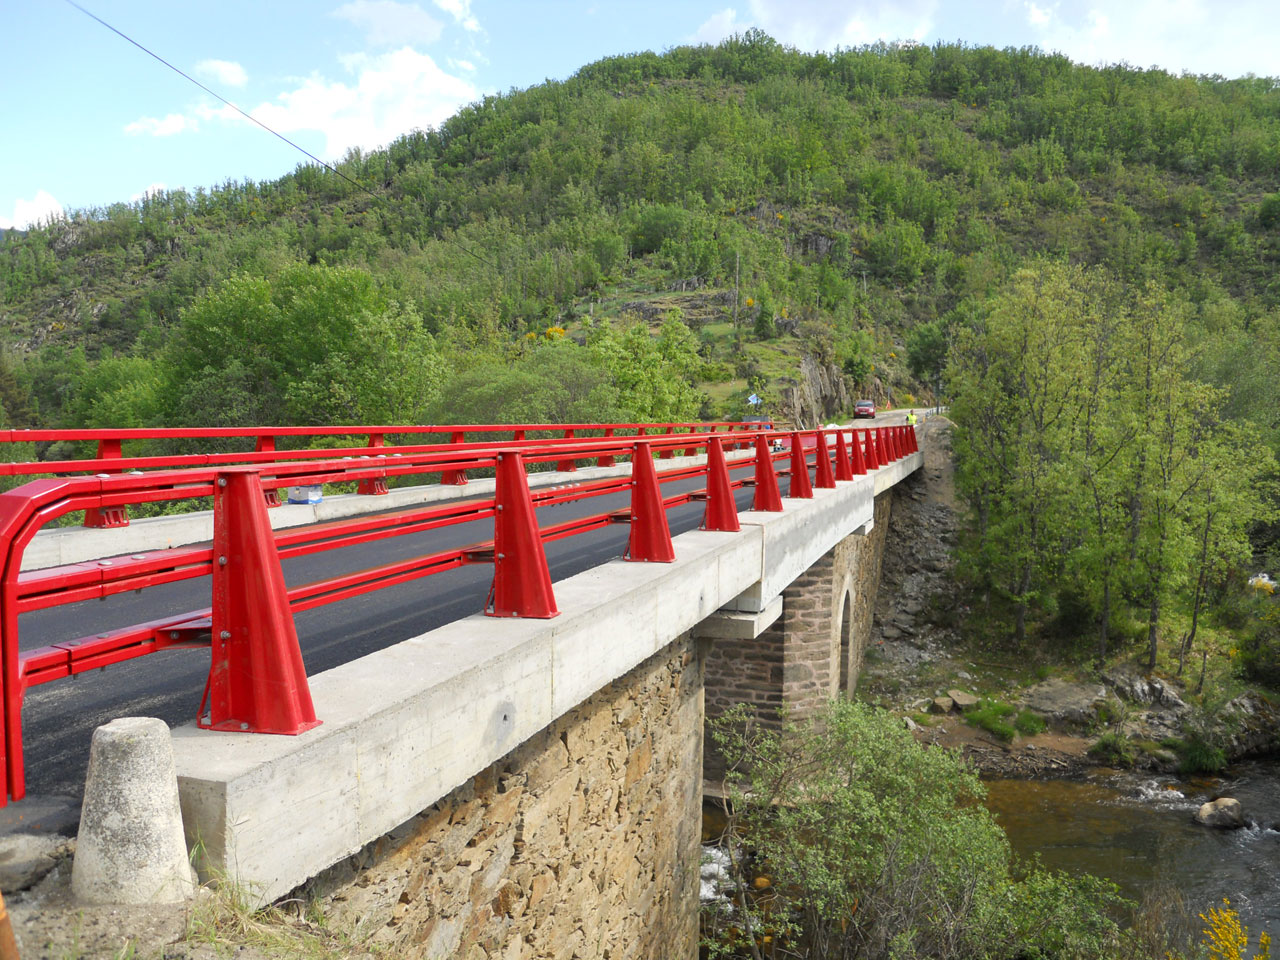 Rehabilitación de estructura en la Carretera M-137 P.K. 29+400